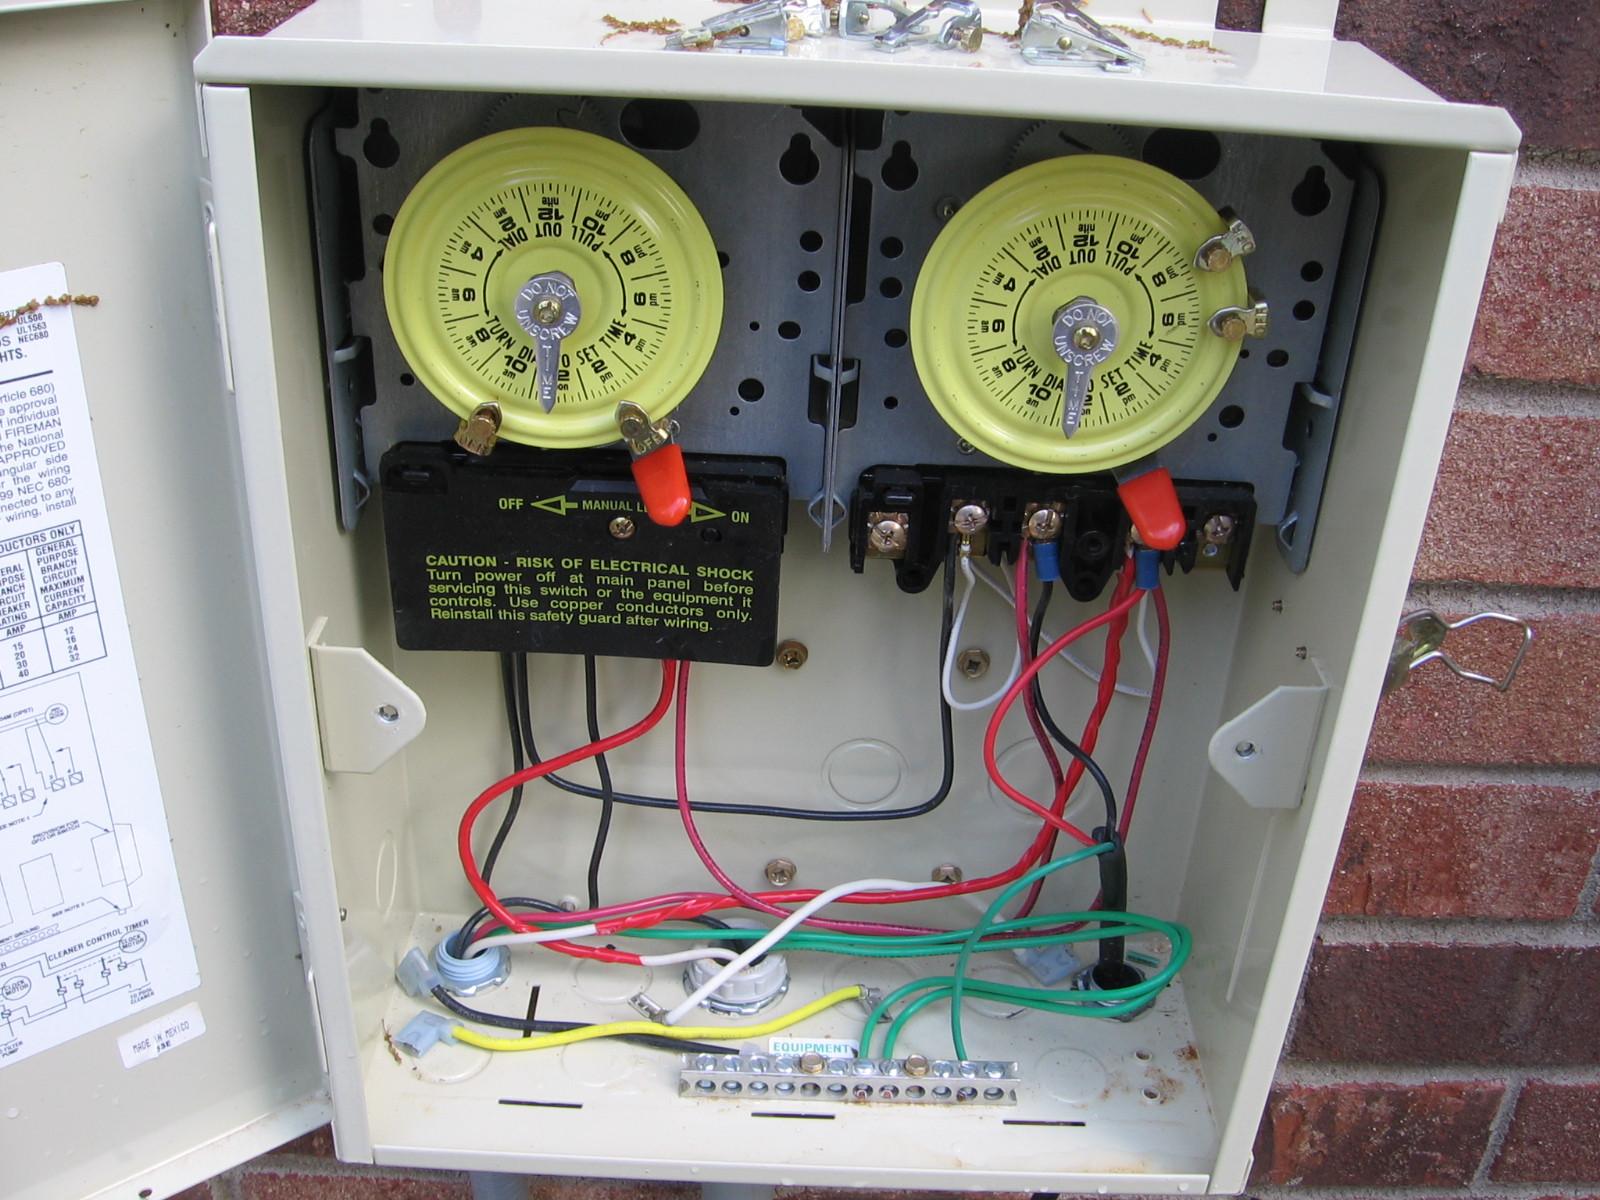 Wiring Diagram Hi Lo Switch Get Free Image About Wiring Diagram